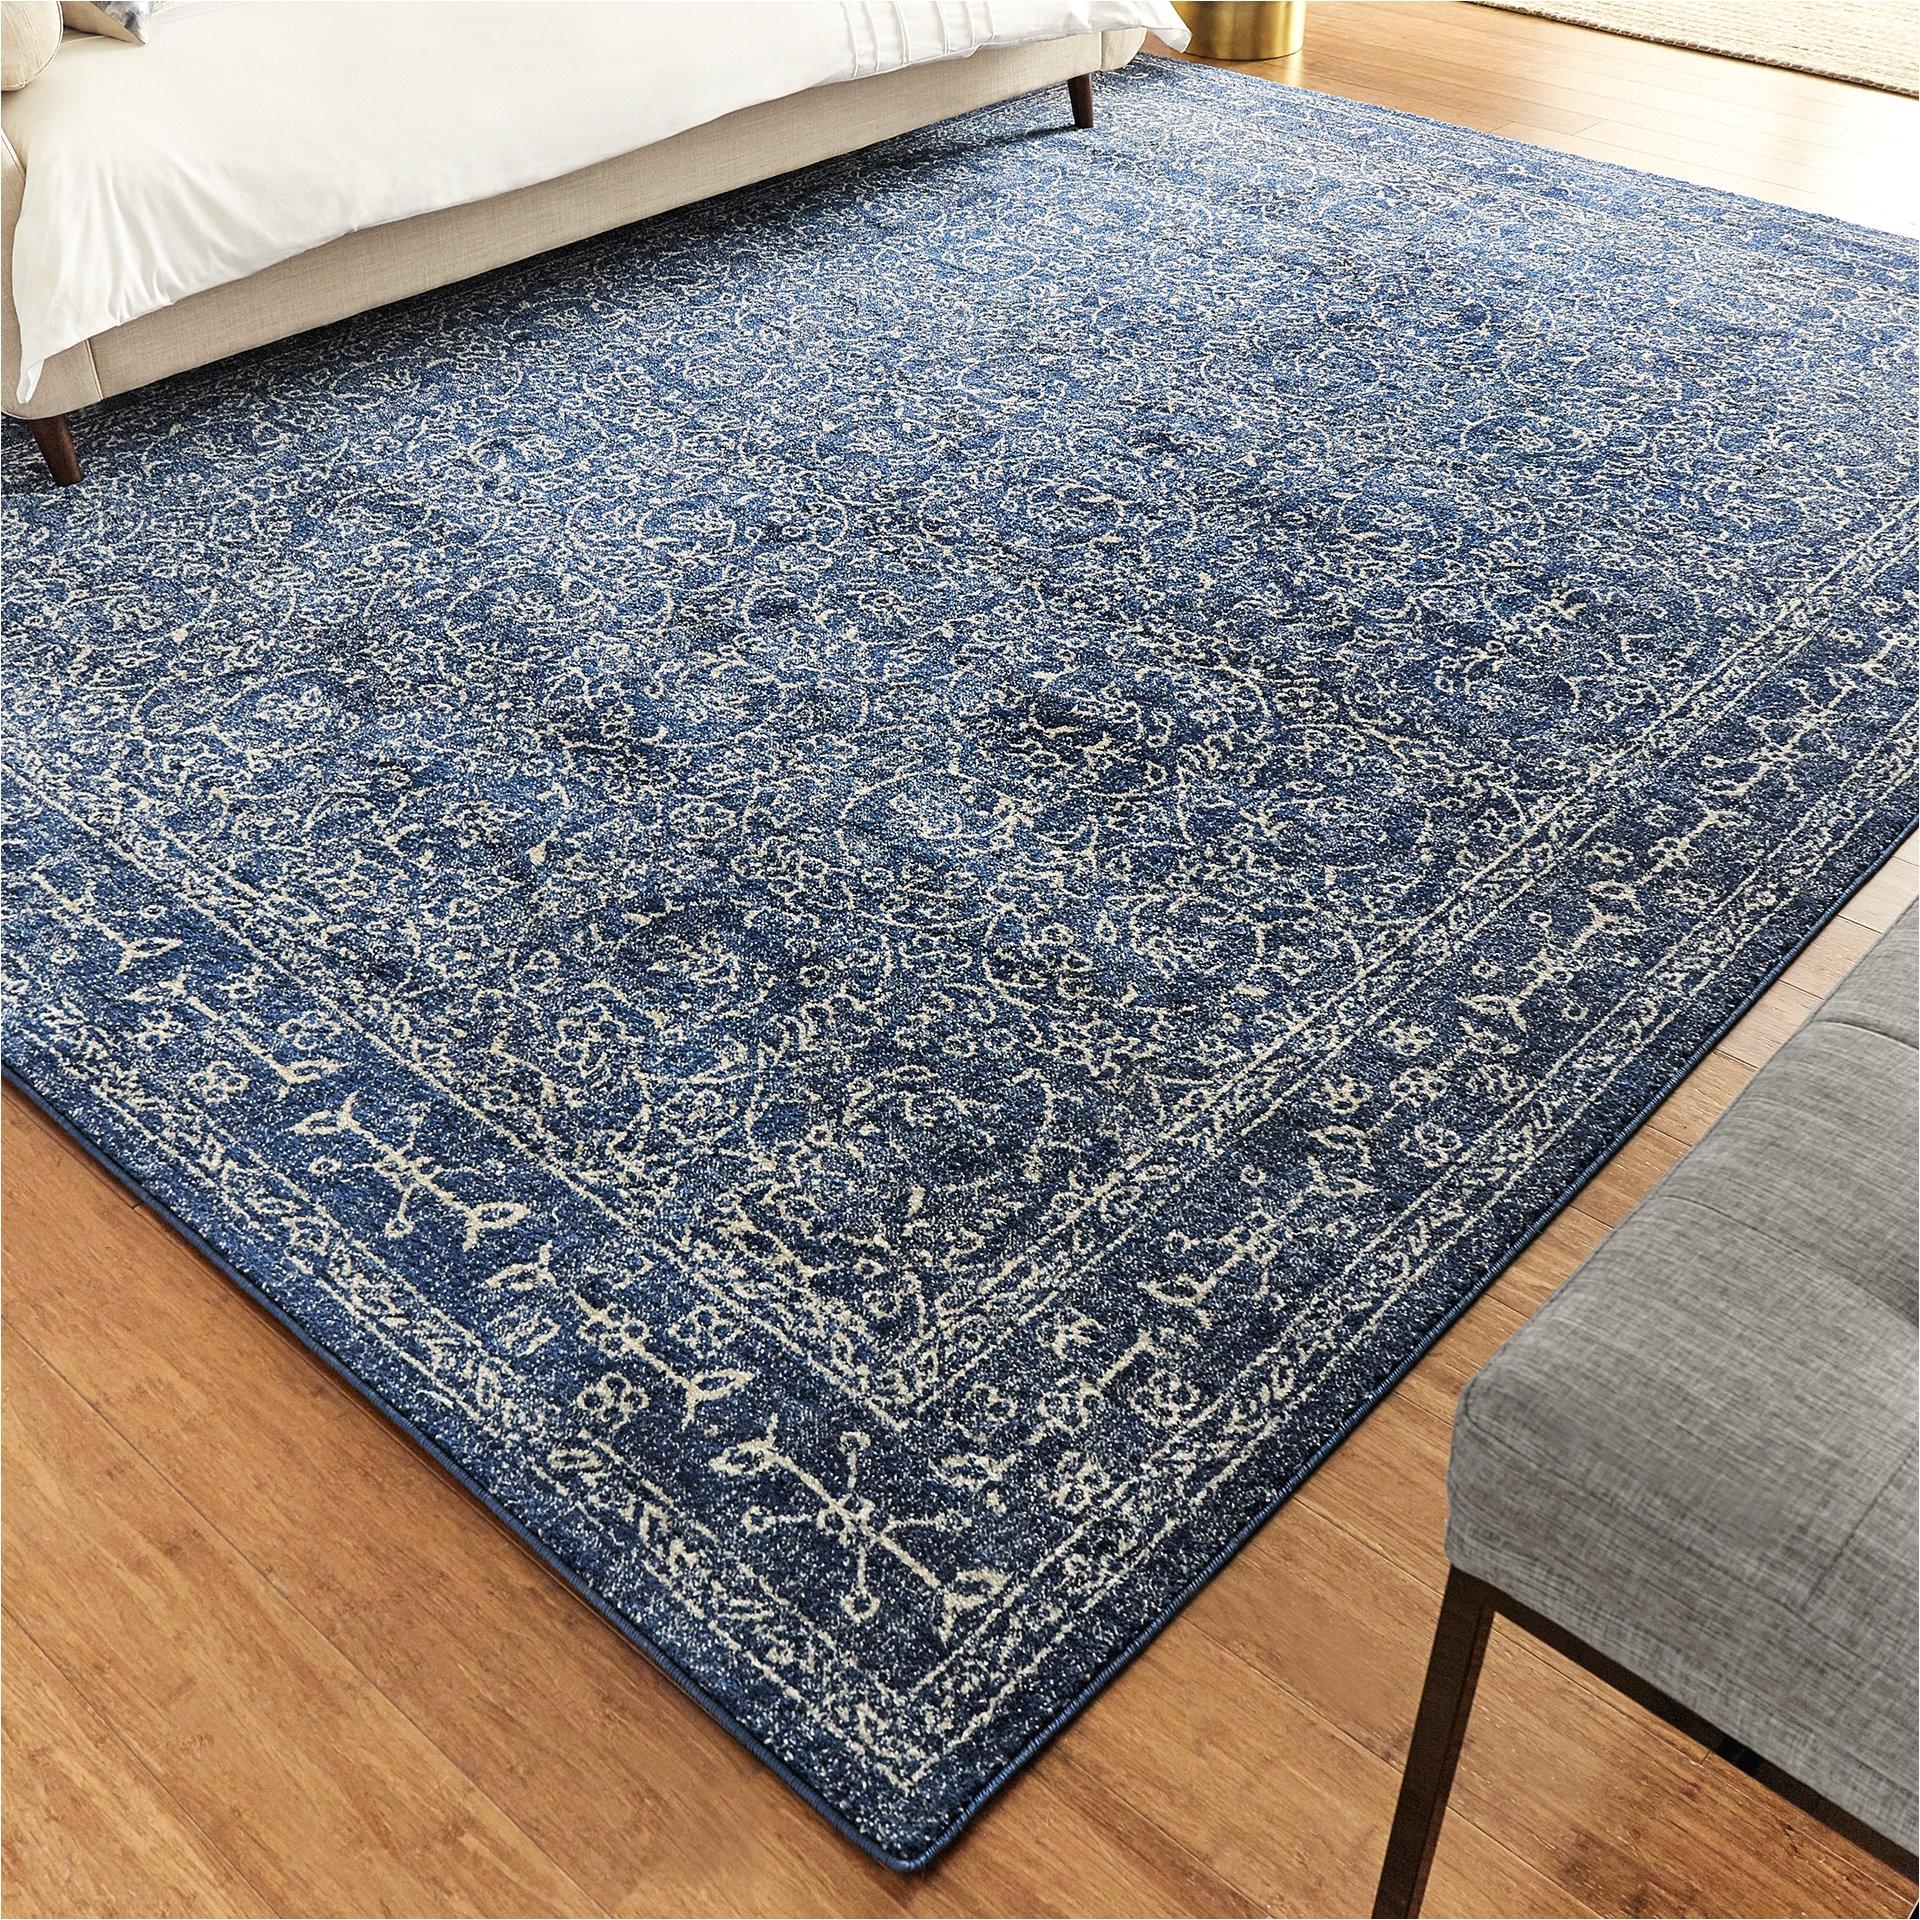 utterback dark blue area rug jpg